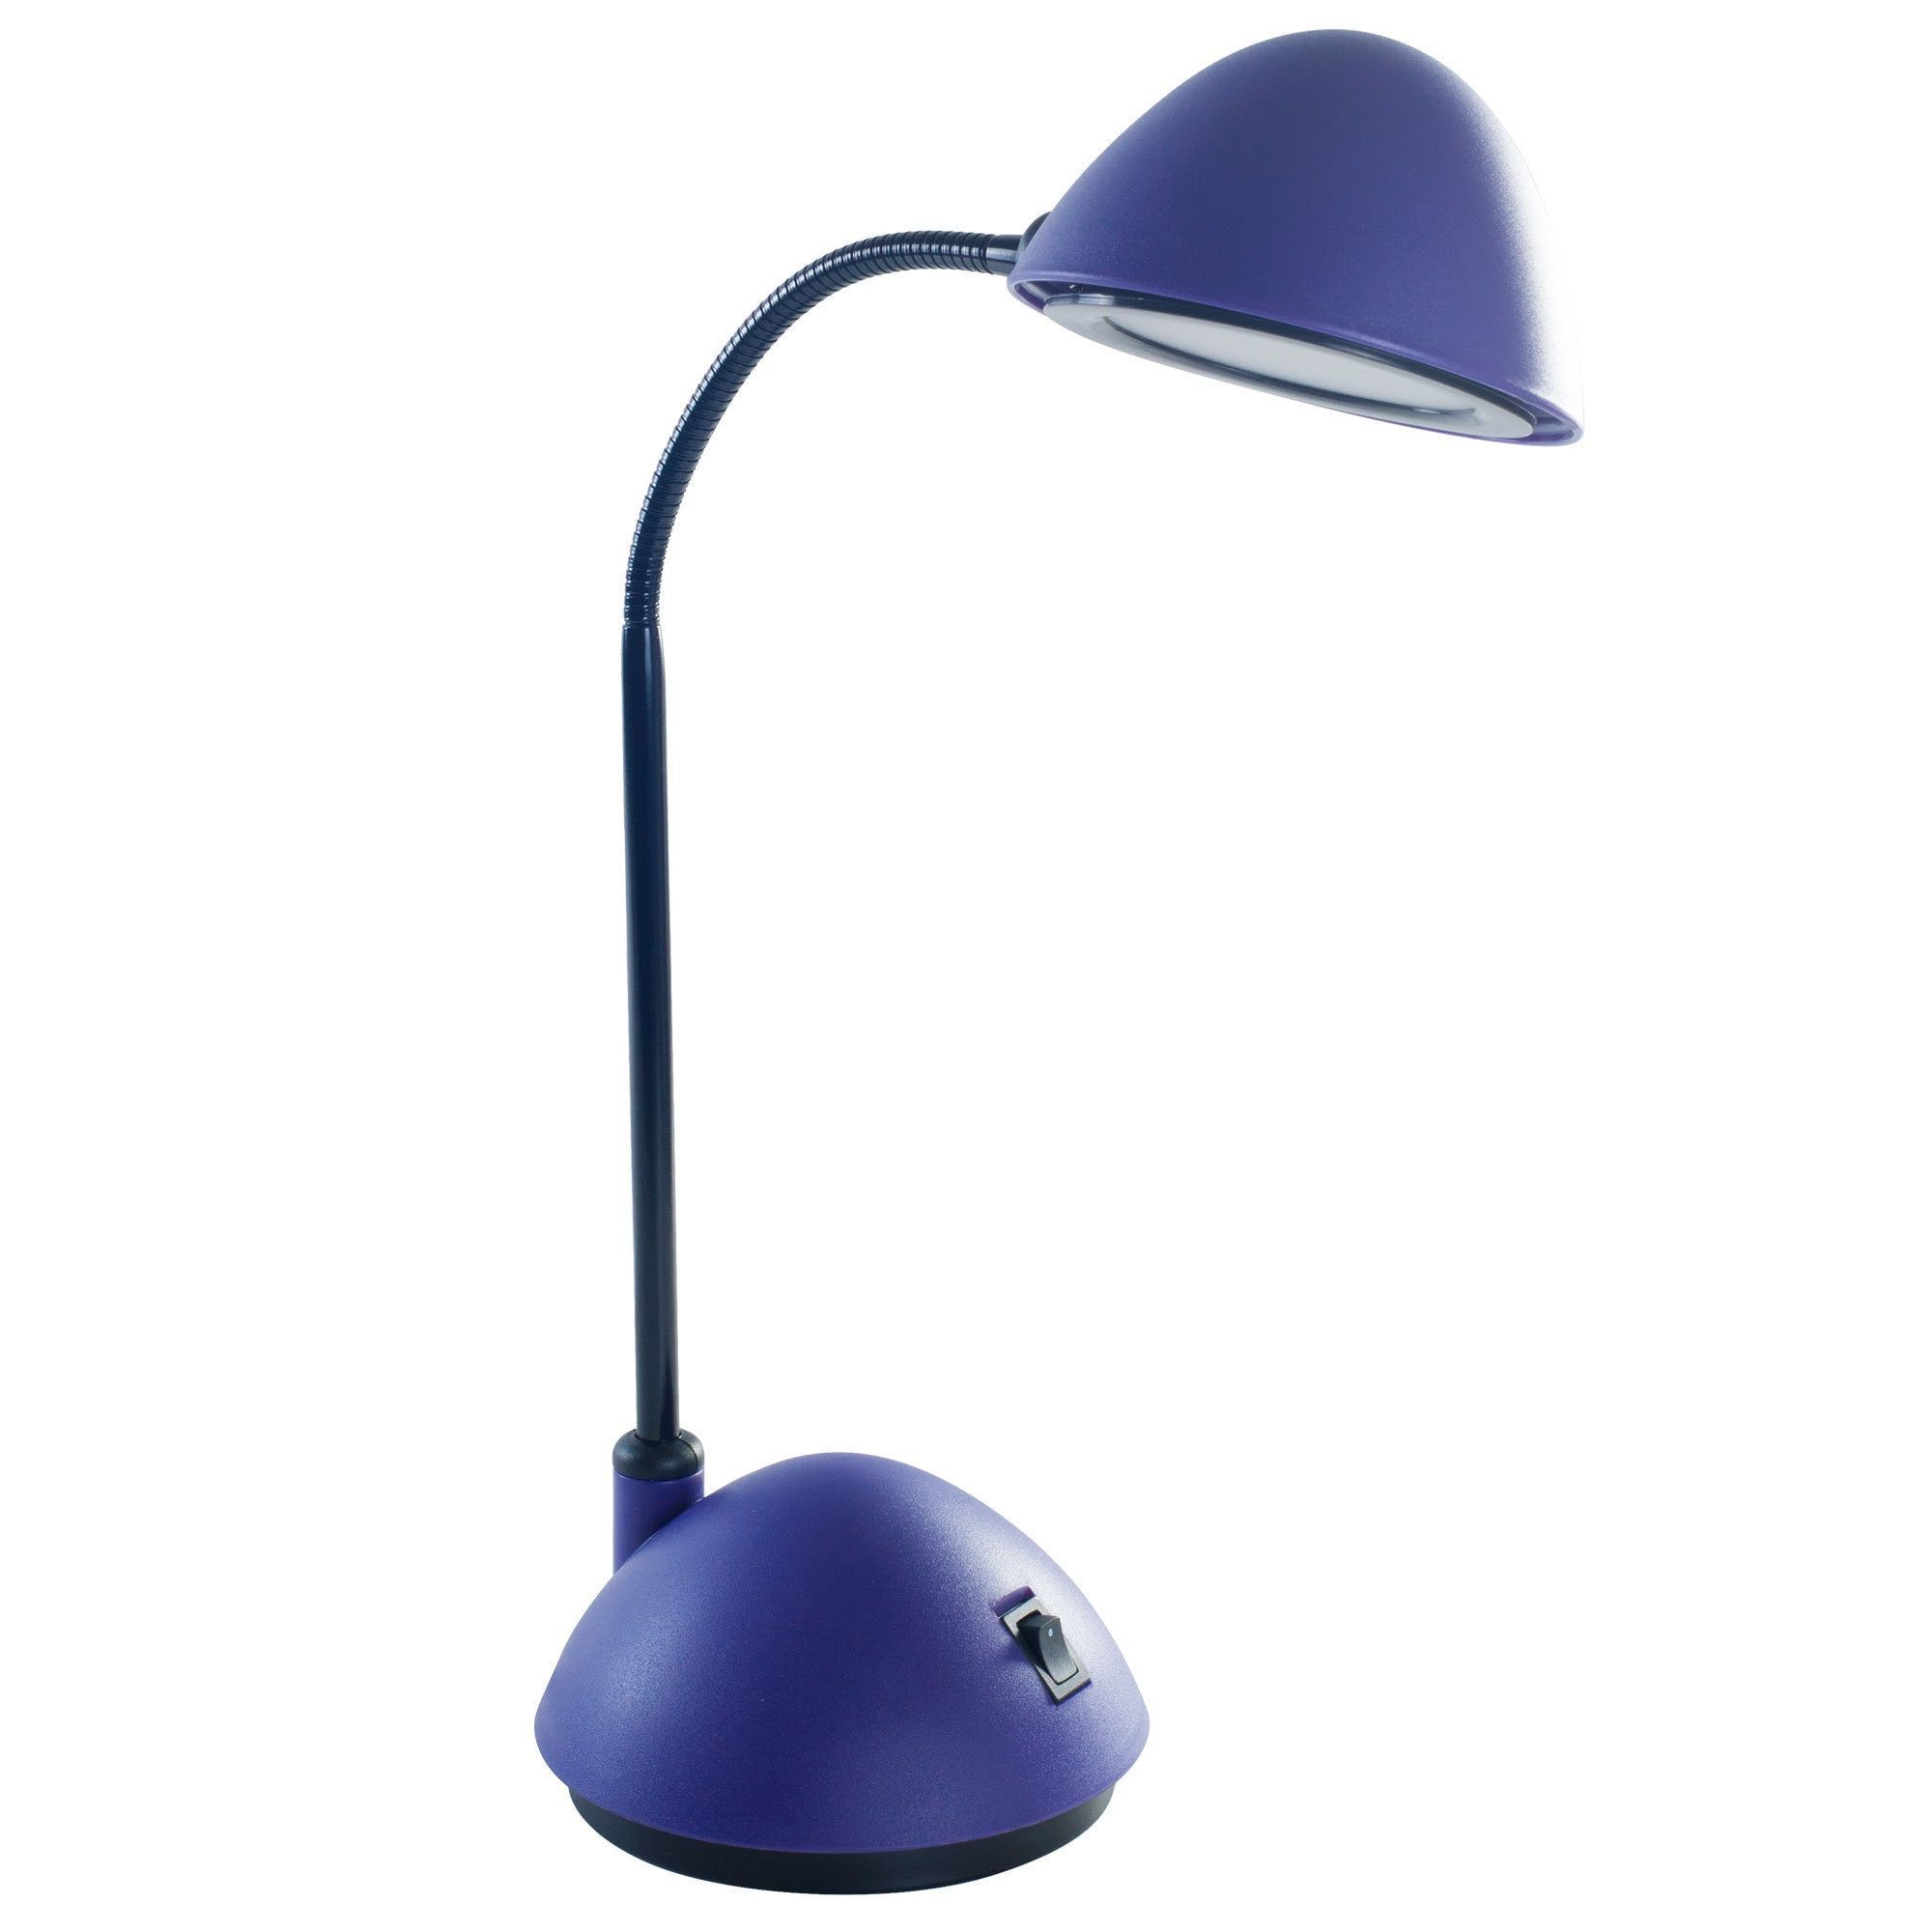 Windsor home bright energy saving led desk lamp pink desk lamp